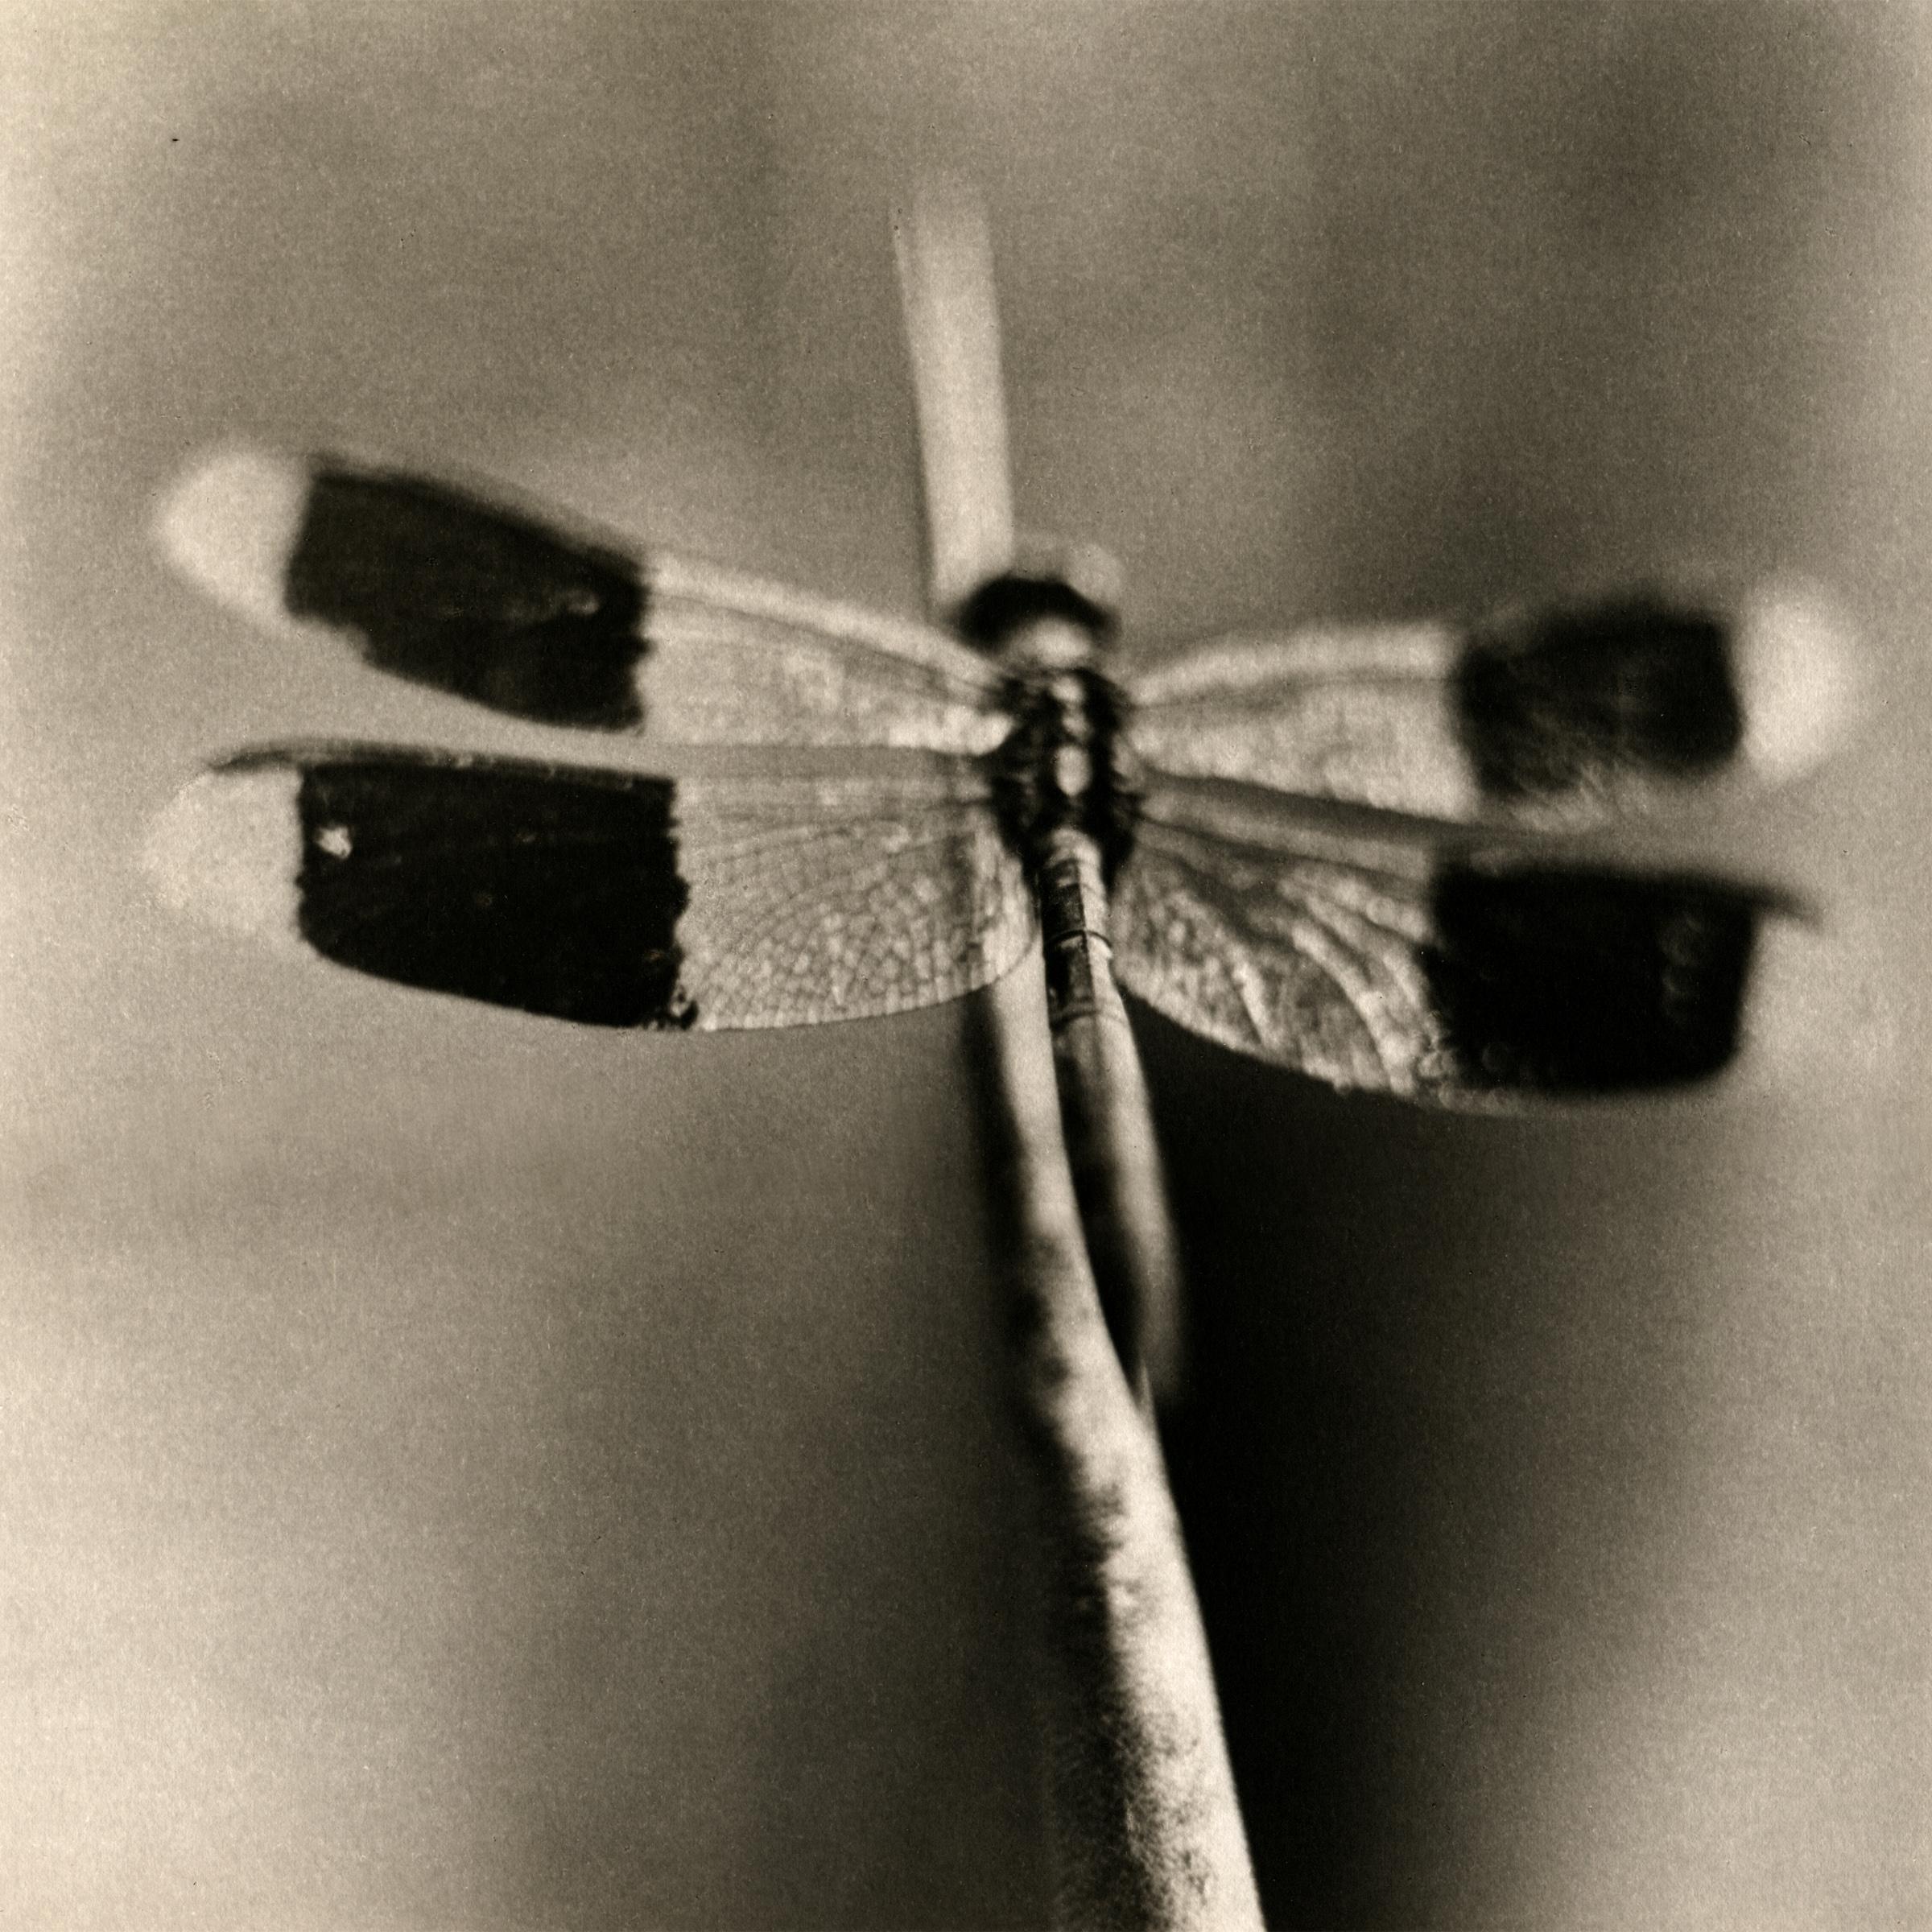 Dragonfly #4, 2004